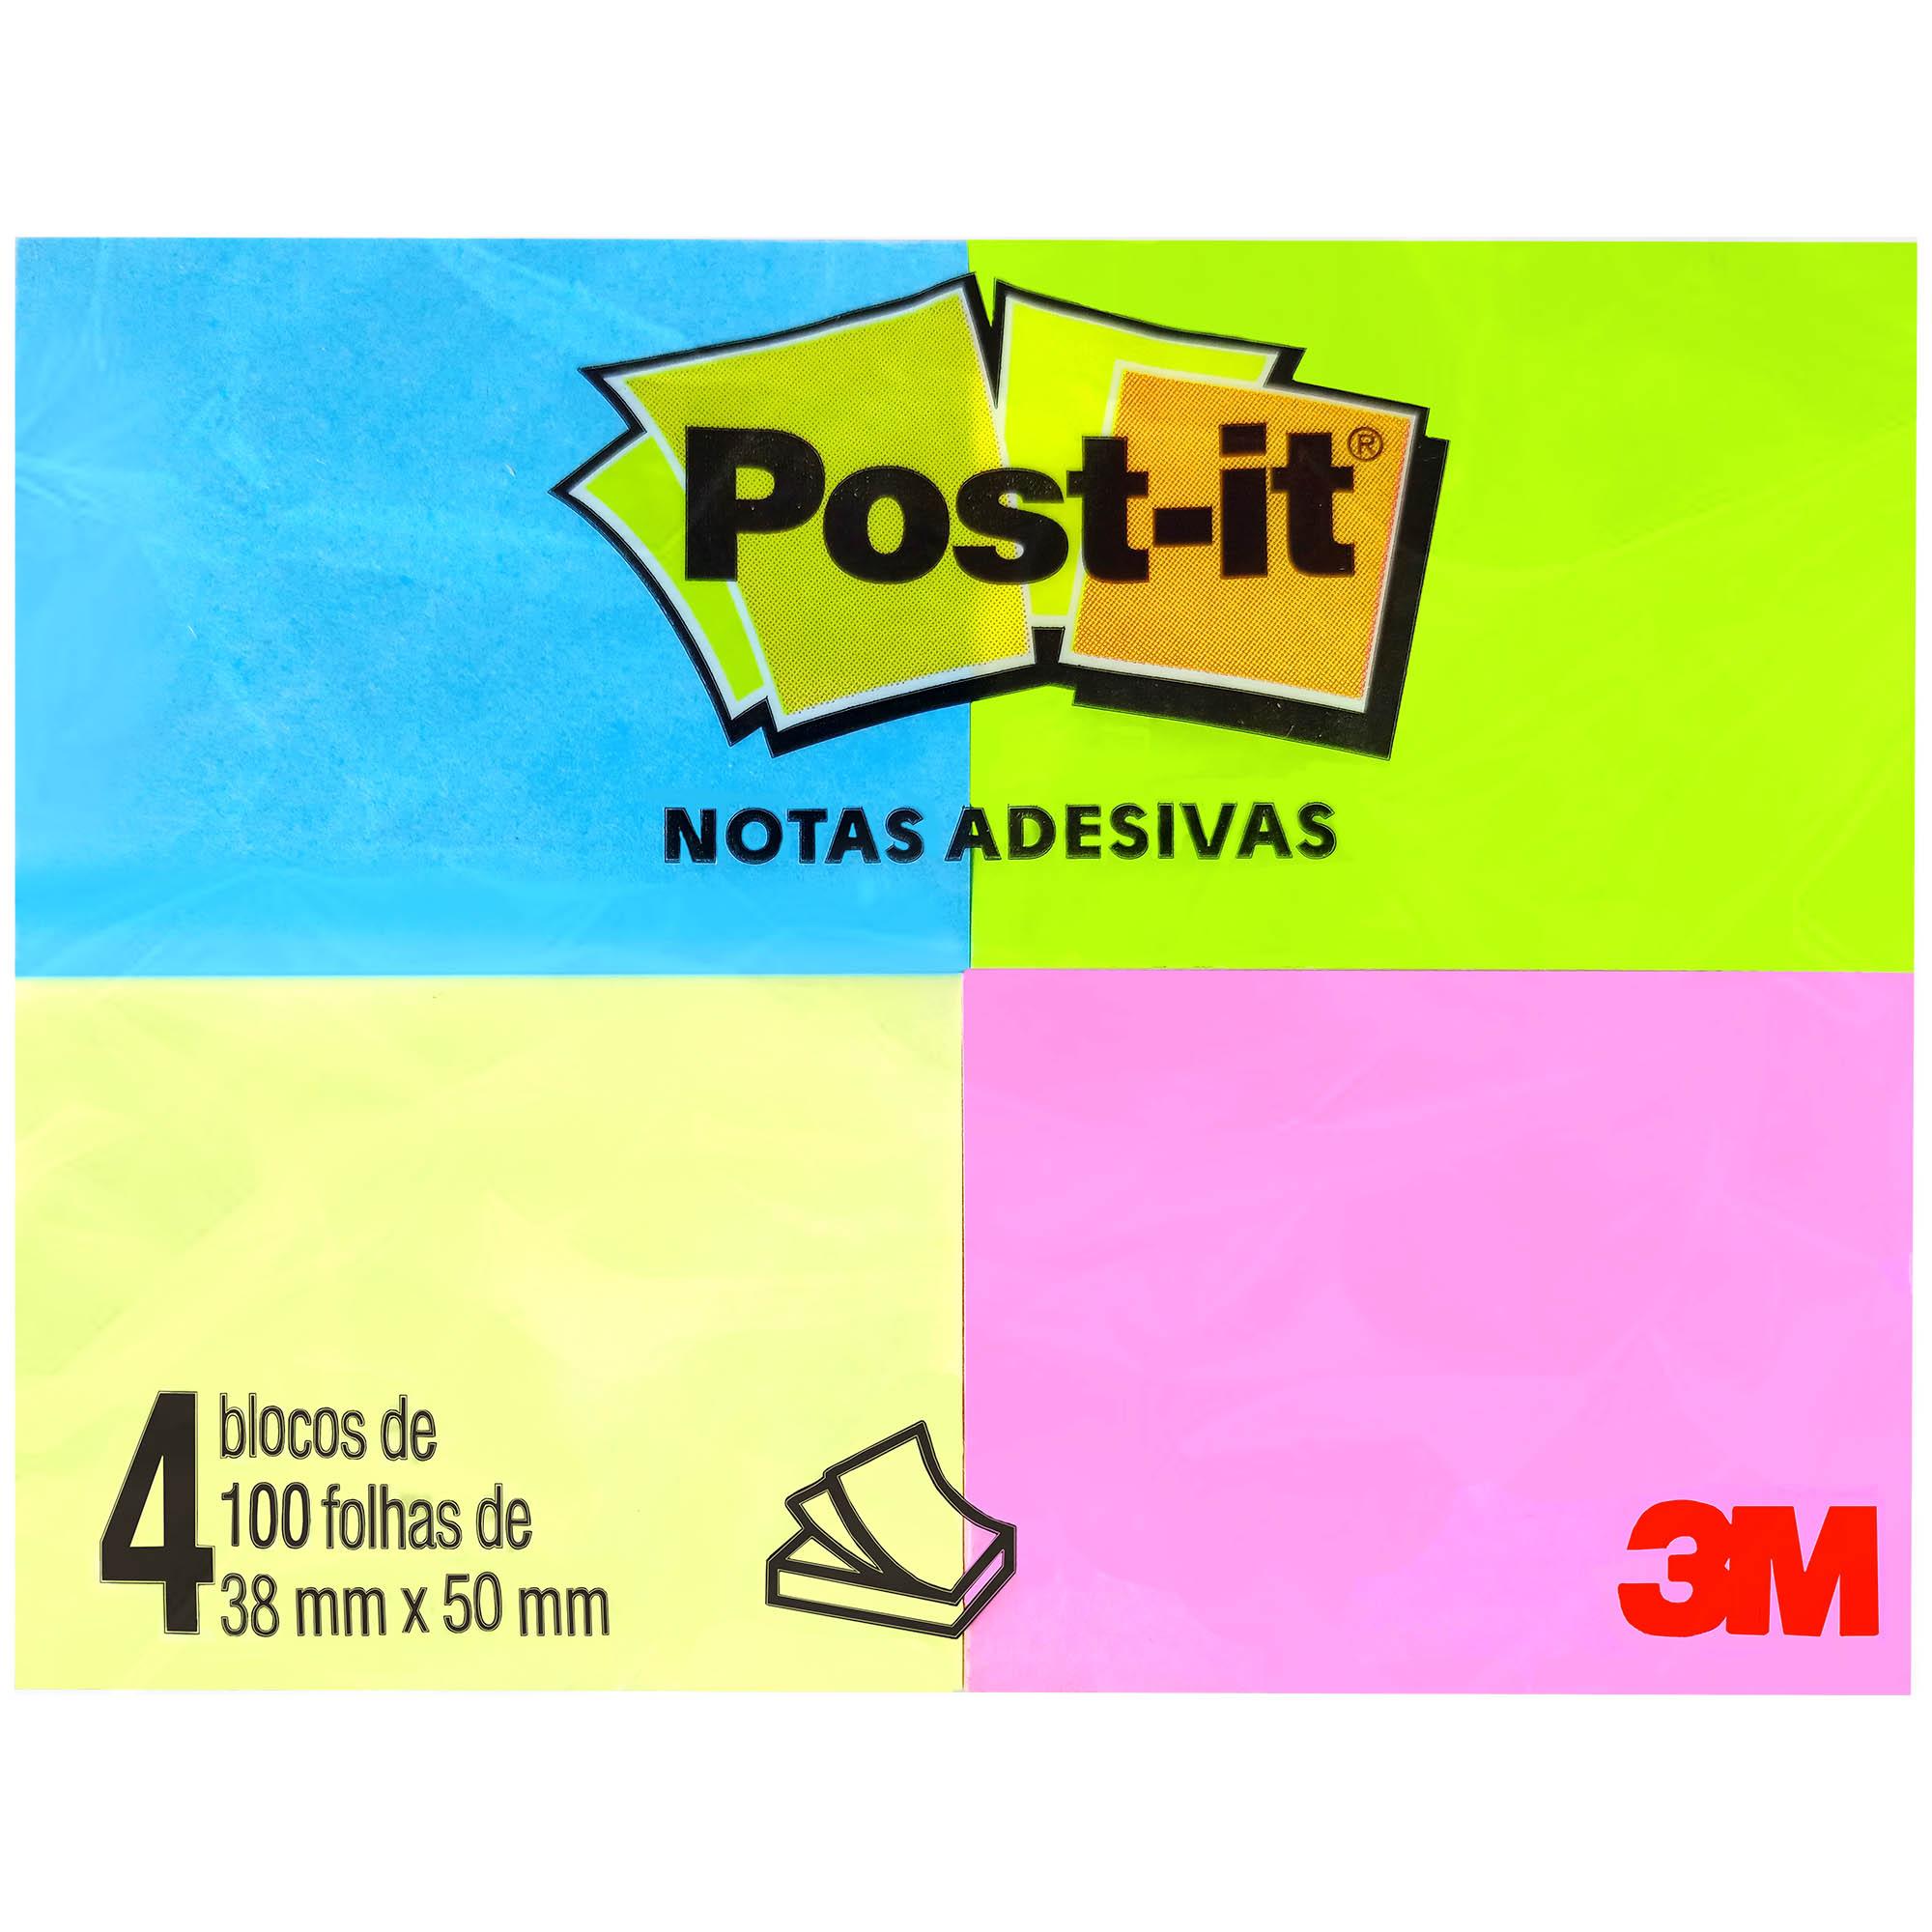 Bloco Autoadesivo Recado Post-it 653 Neon 38X50 mm C/100fls. Pct. C/04 HB004088348 - 3M